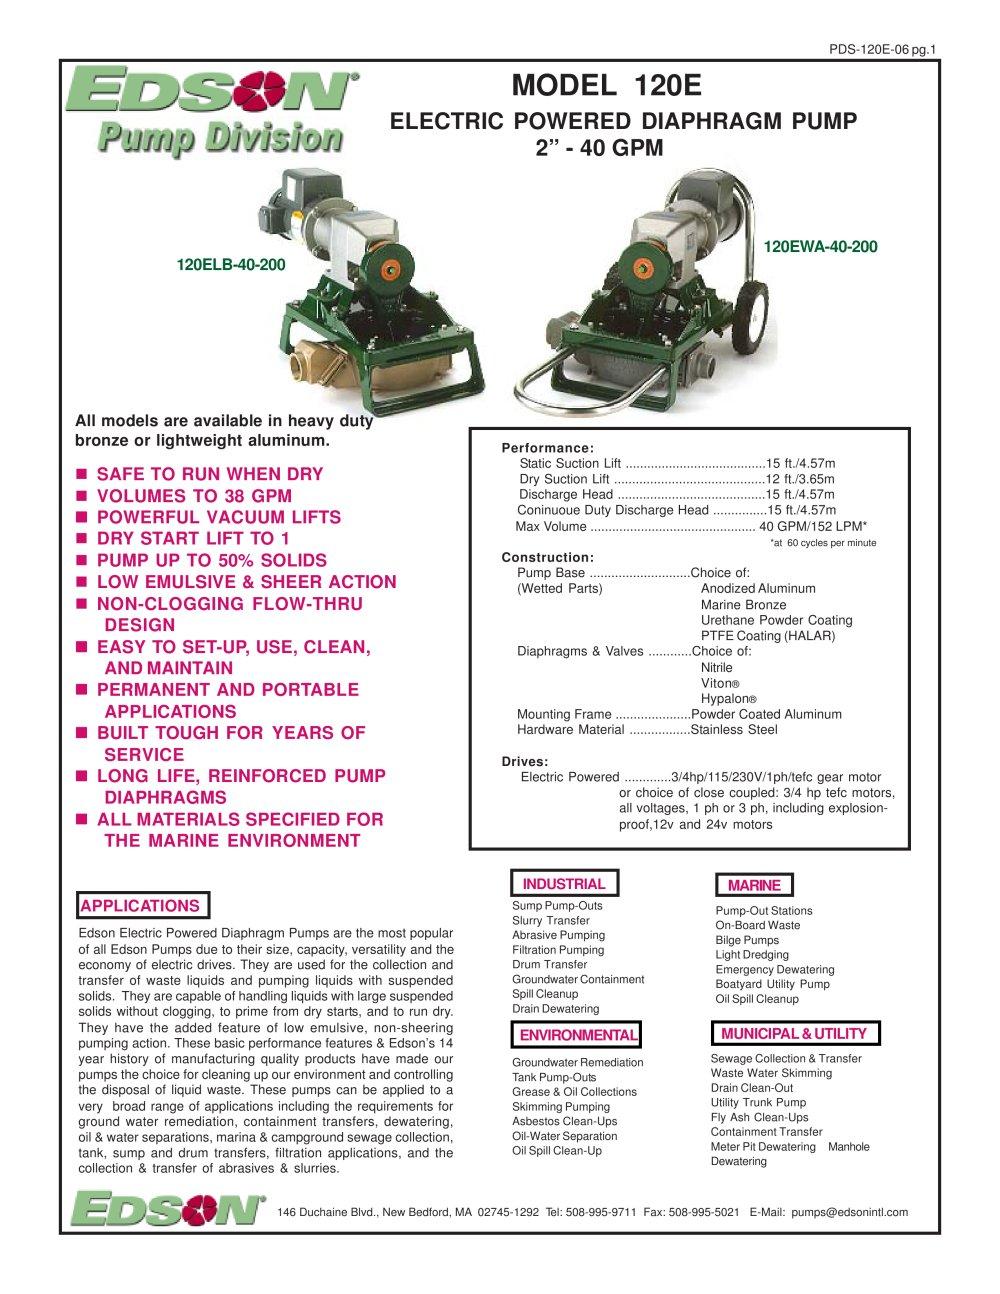 120e electric powered diaphragm pump edson international pdf 120e electric powered diaphragm pump 1 2 pages ccuart Gallery